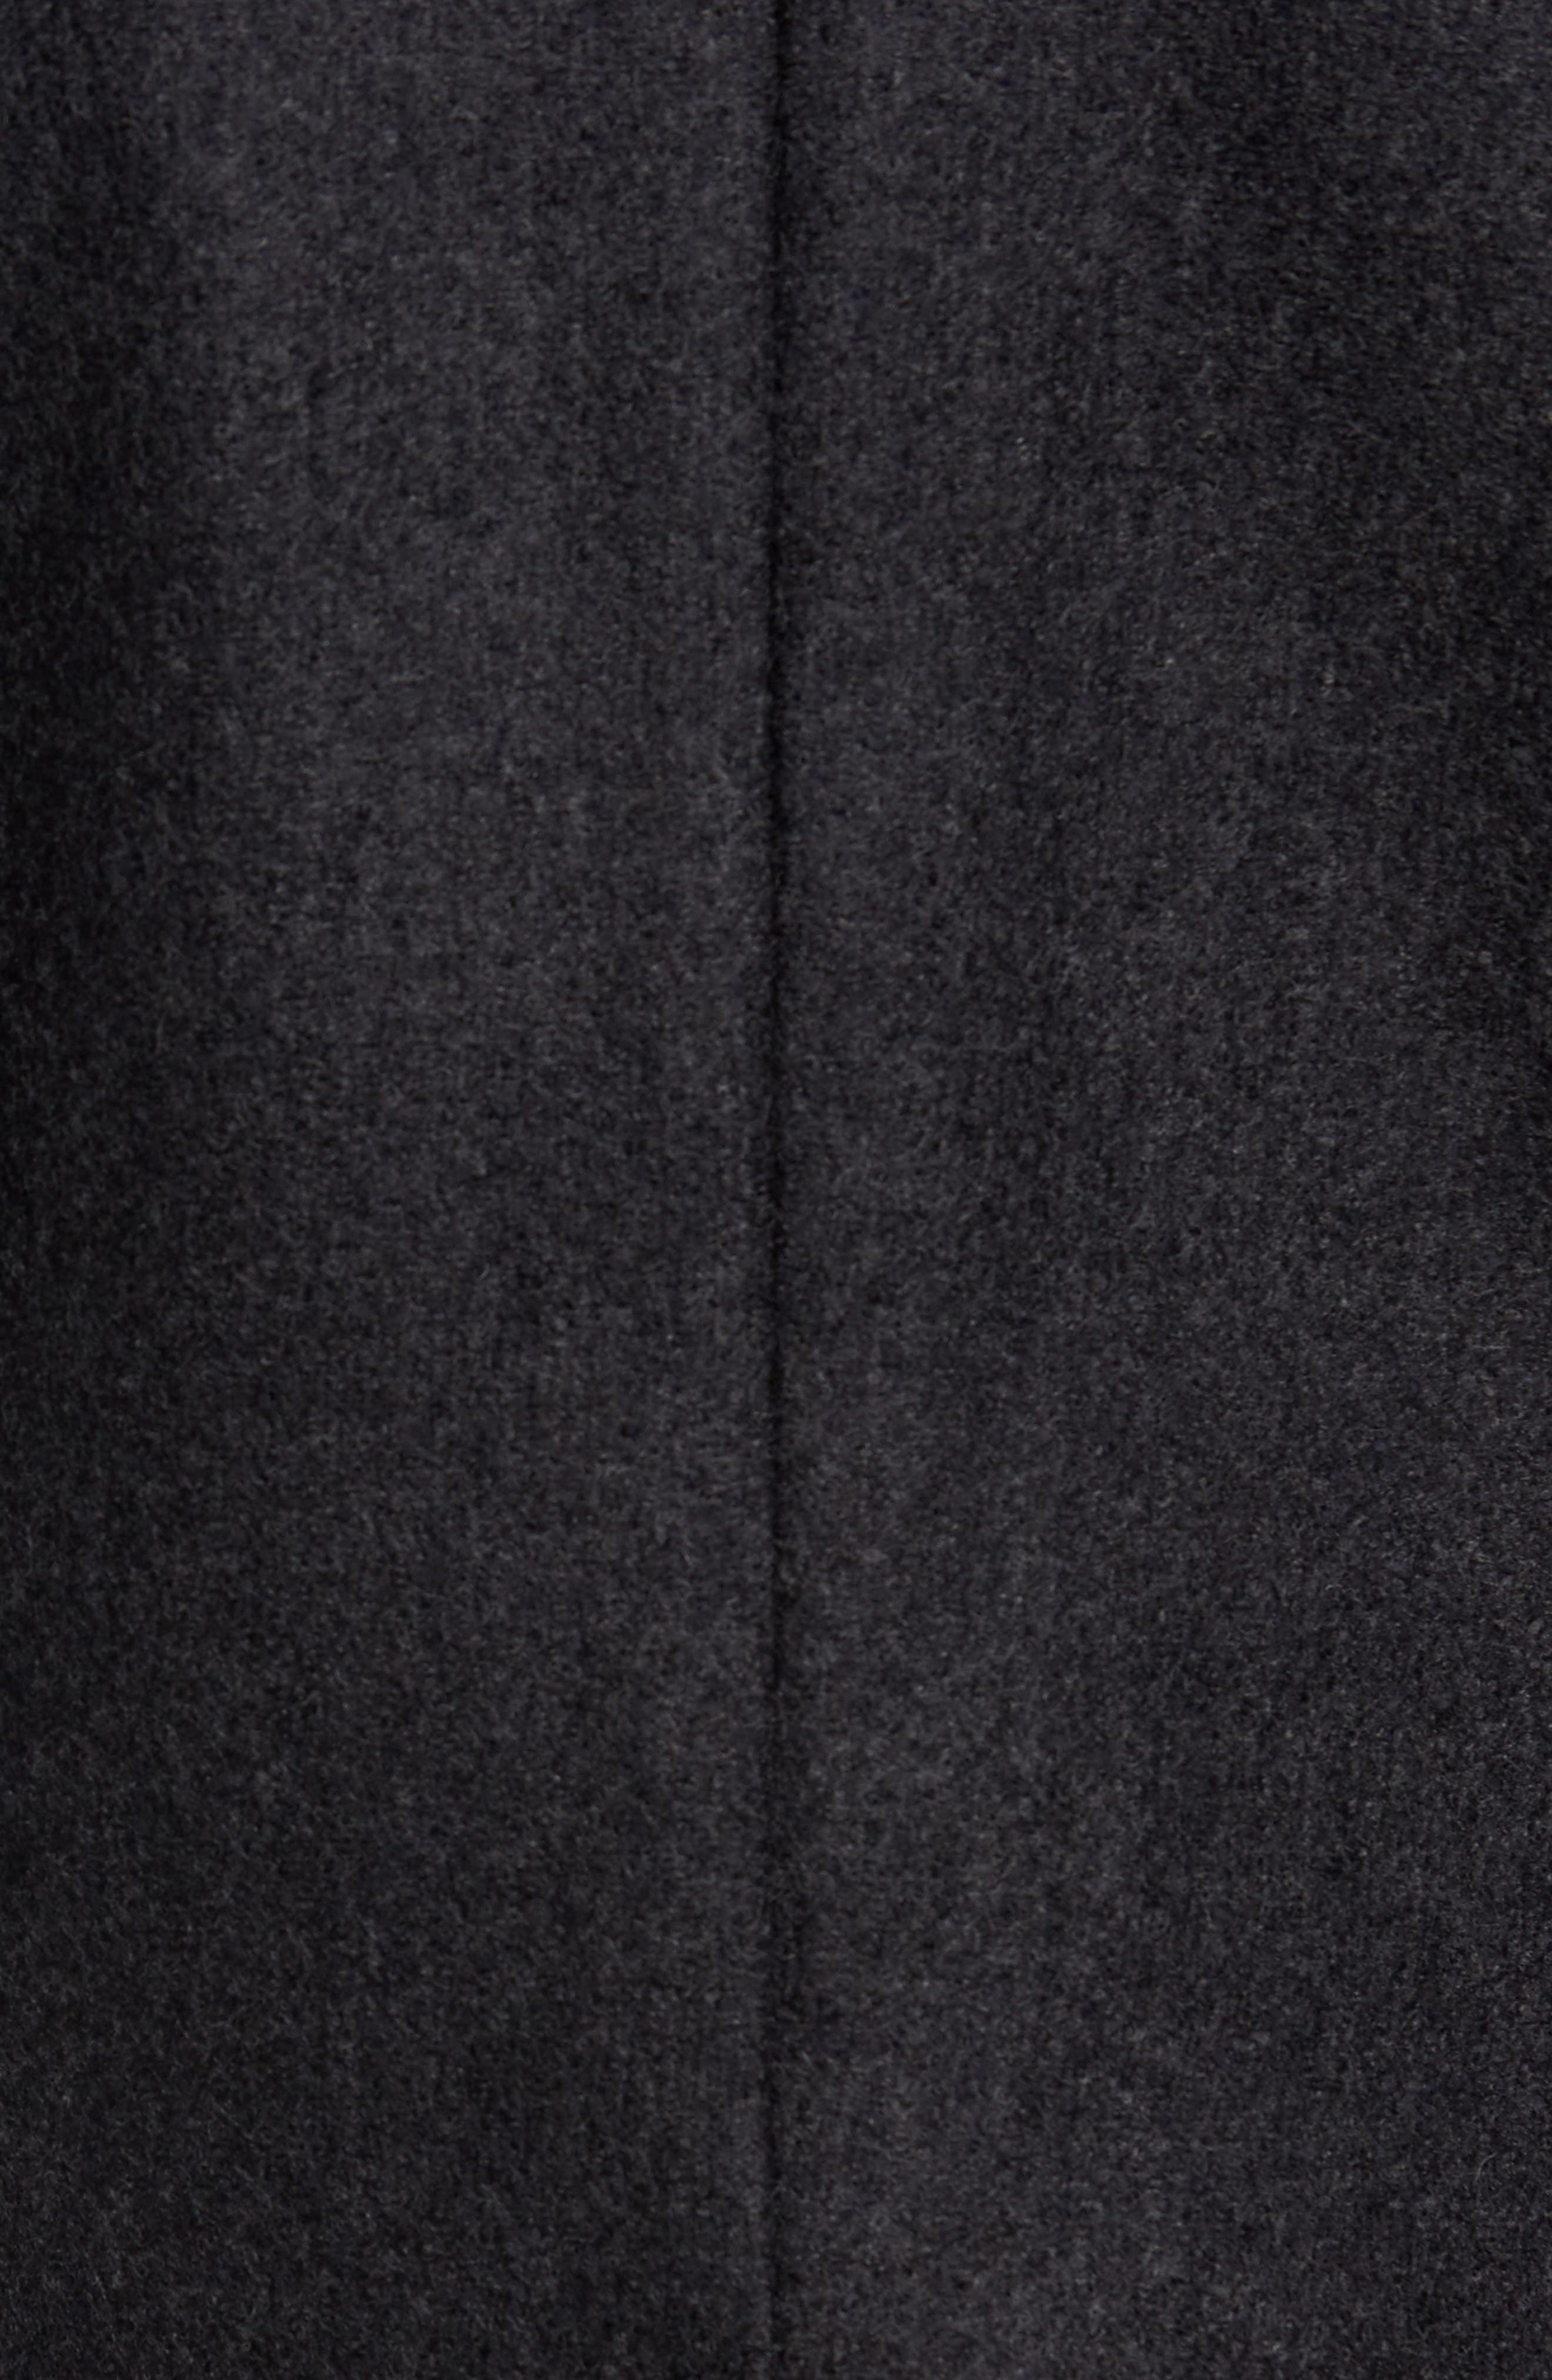 Bond Wool Peacoat,                             Alternate thumbnail 6, color,                             010